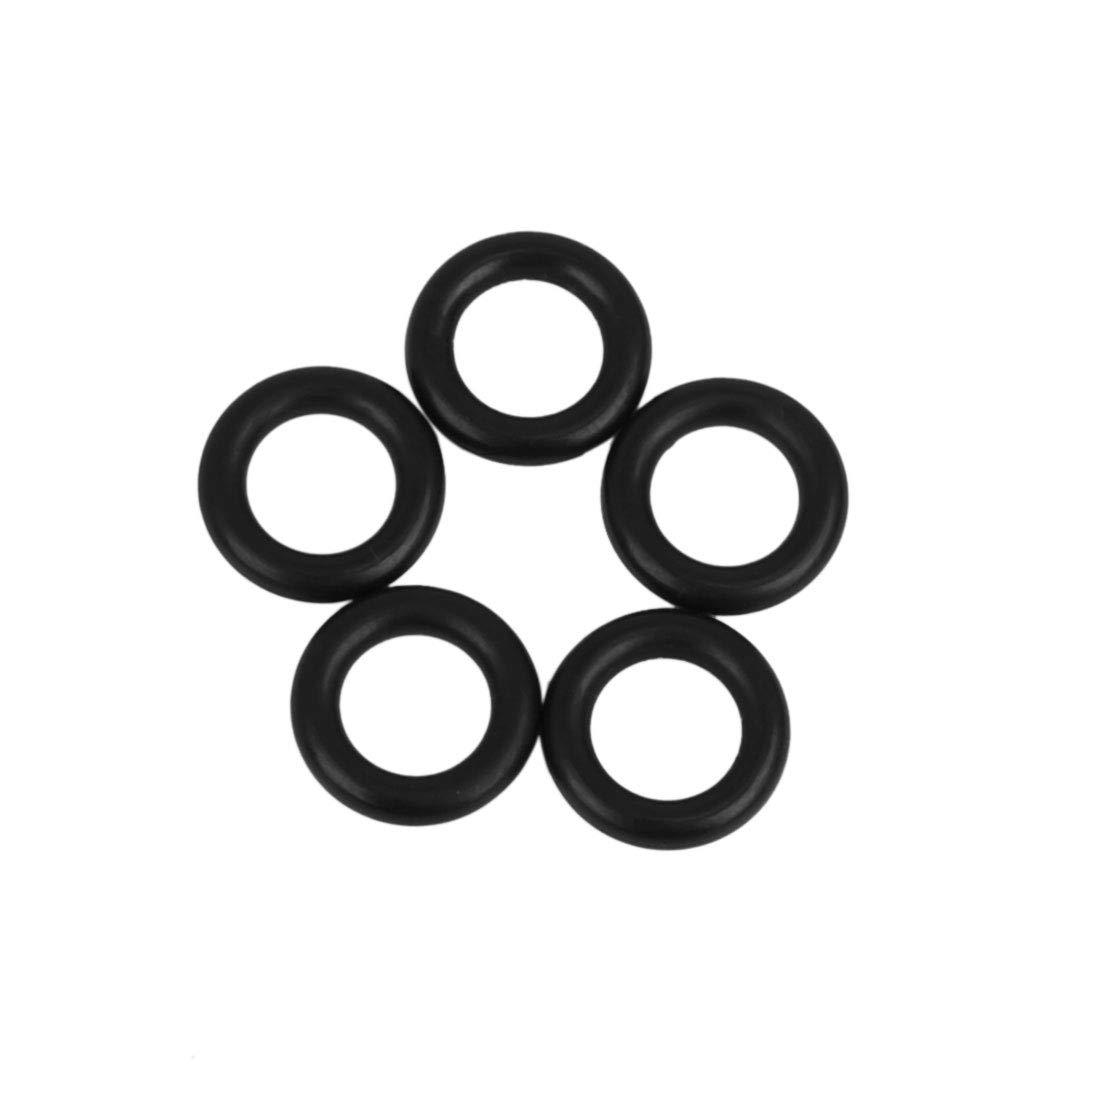 5pcs Black NBR70 Rubber O-Ring Washer Sealing Gasket for Car 10 x 2.5mm